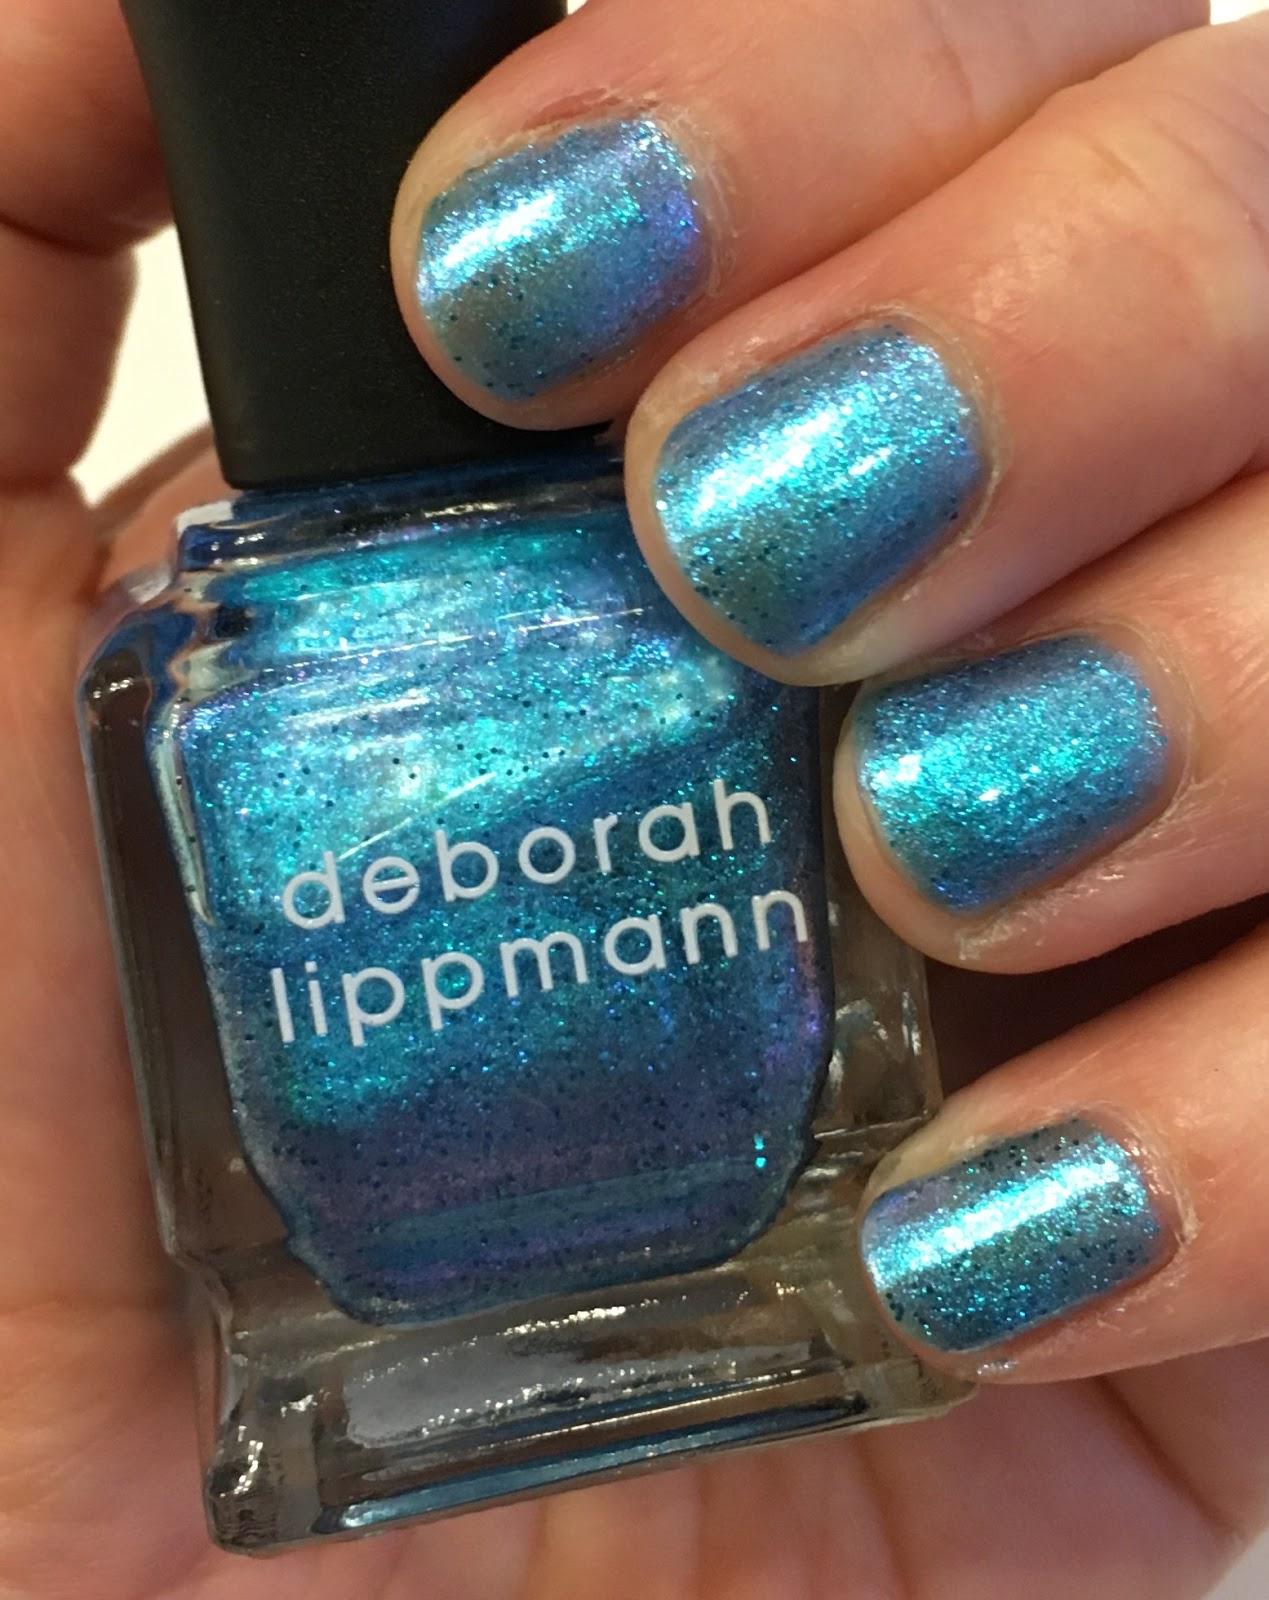 Fashion style Lippmann deborah fantastical holiday nail polish collection for woman